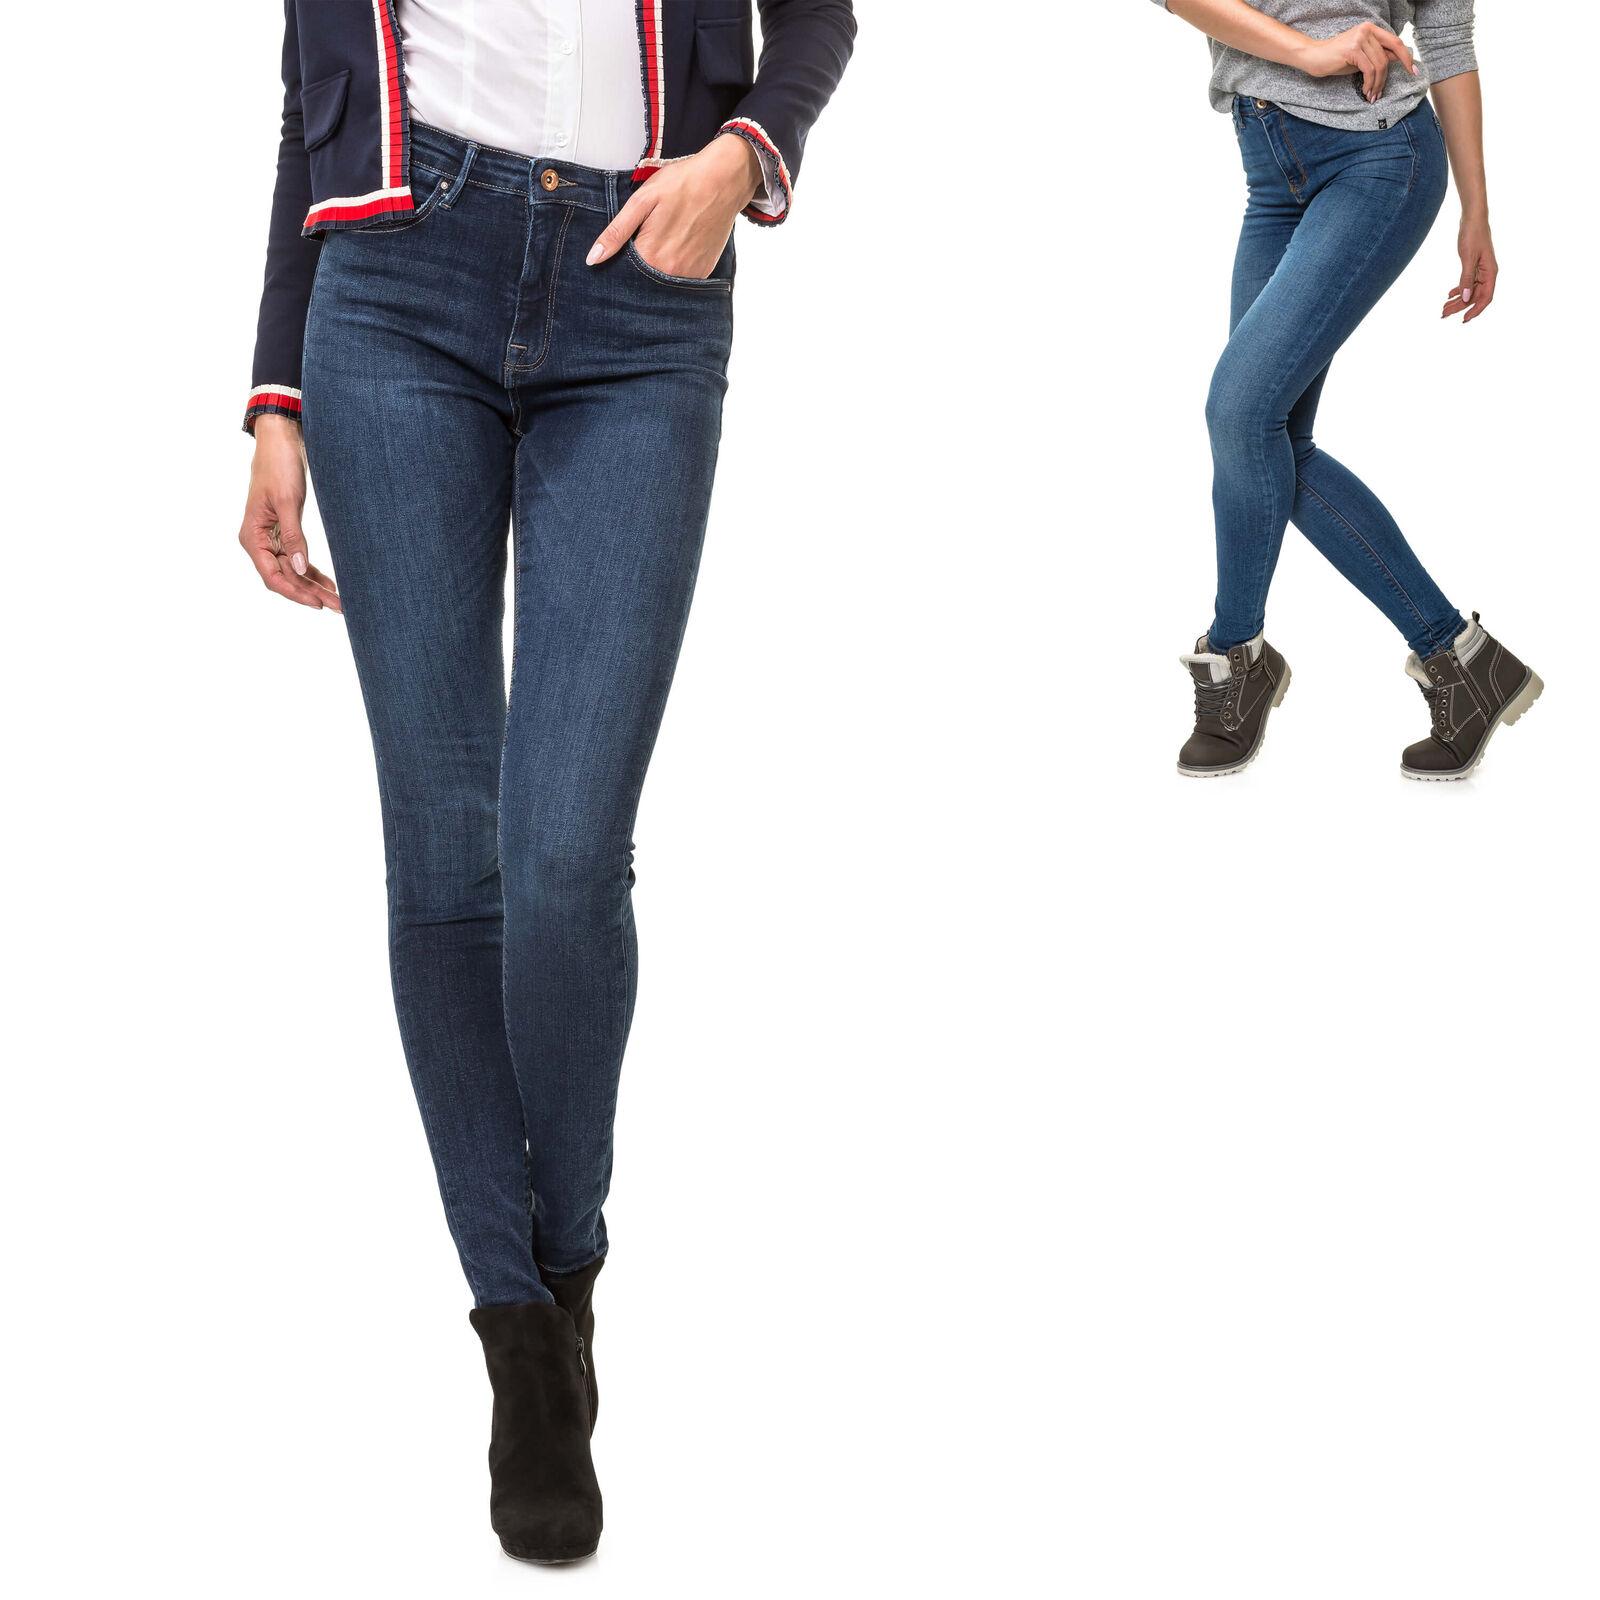 Only Damen High Waist Skinny Jeans Denim Stretchhose Damenhose Lange Hose Slim